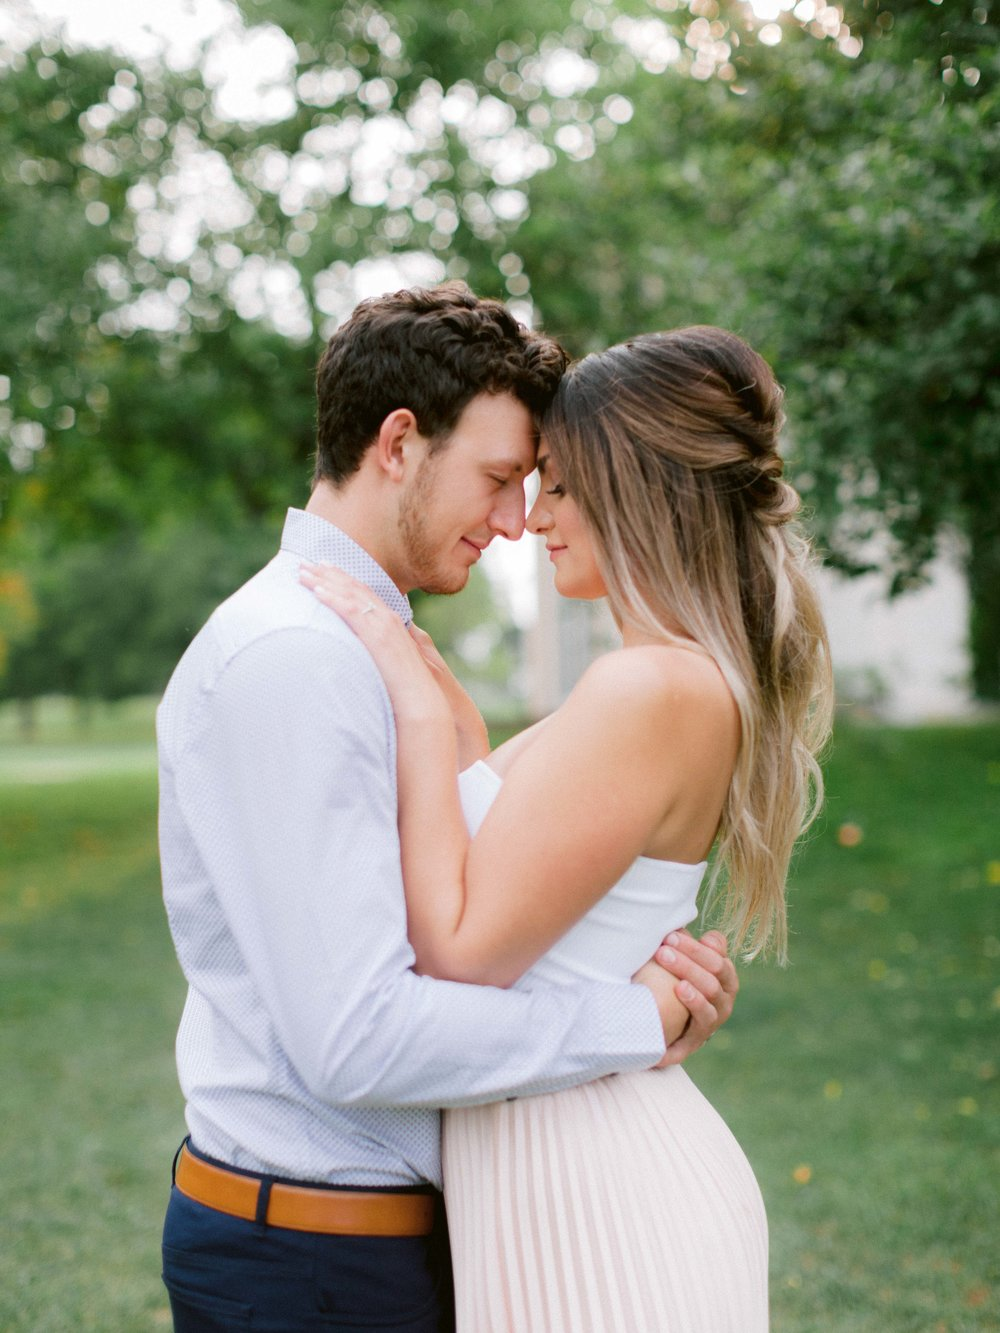 Summer_Engagament_Session_Toronto_Niagara_Wedding_Photographer (30 of 67).jpg